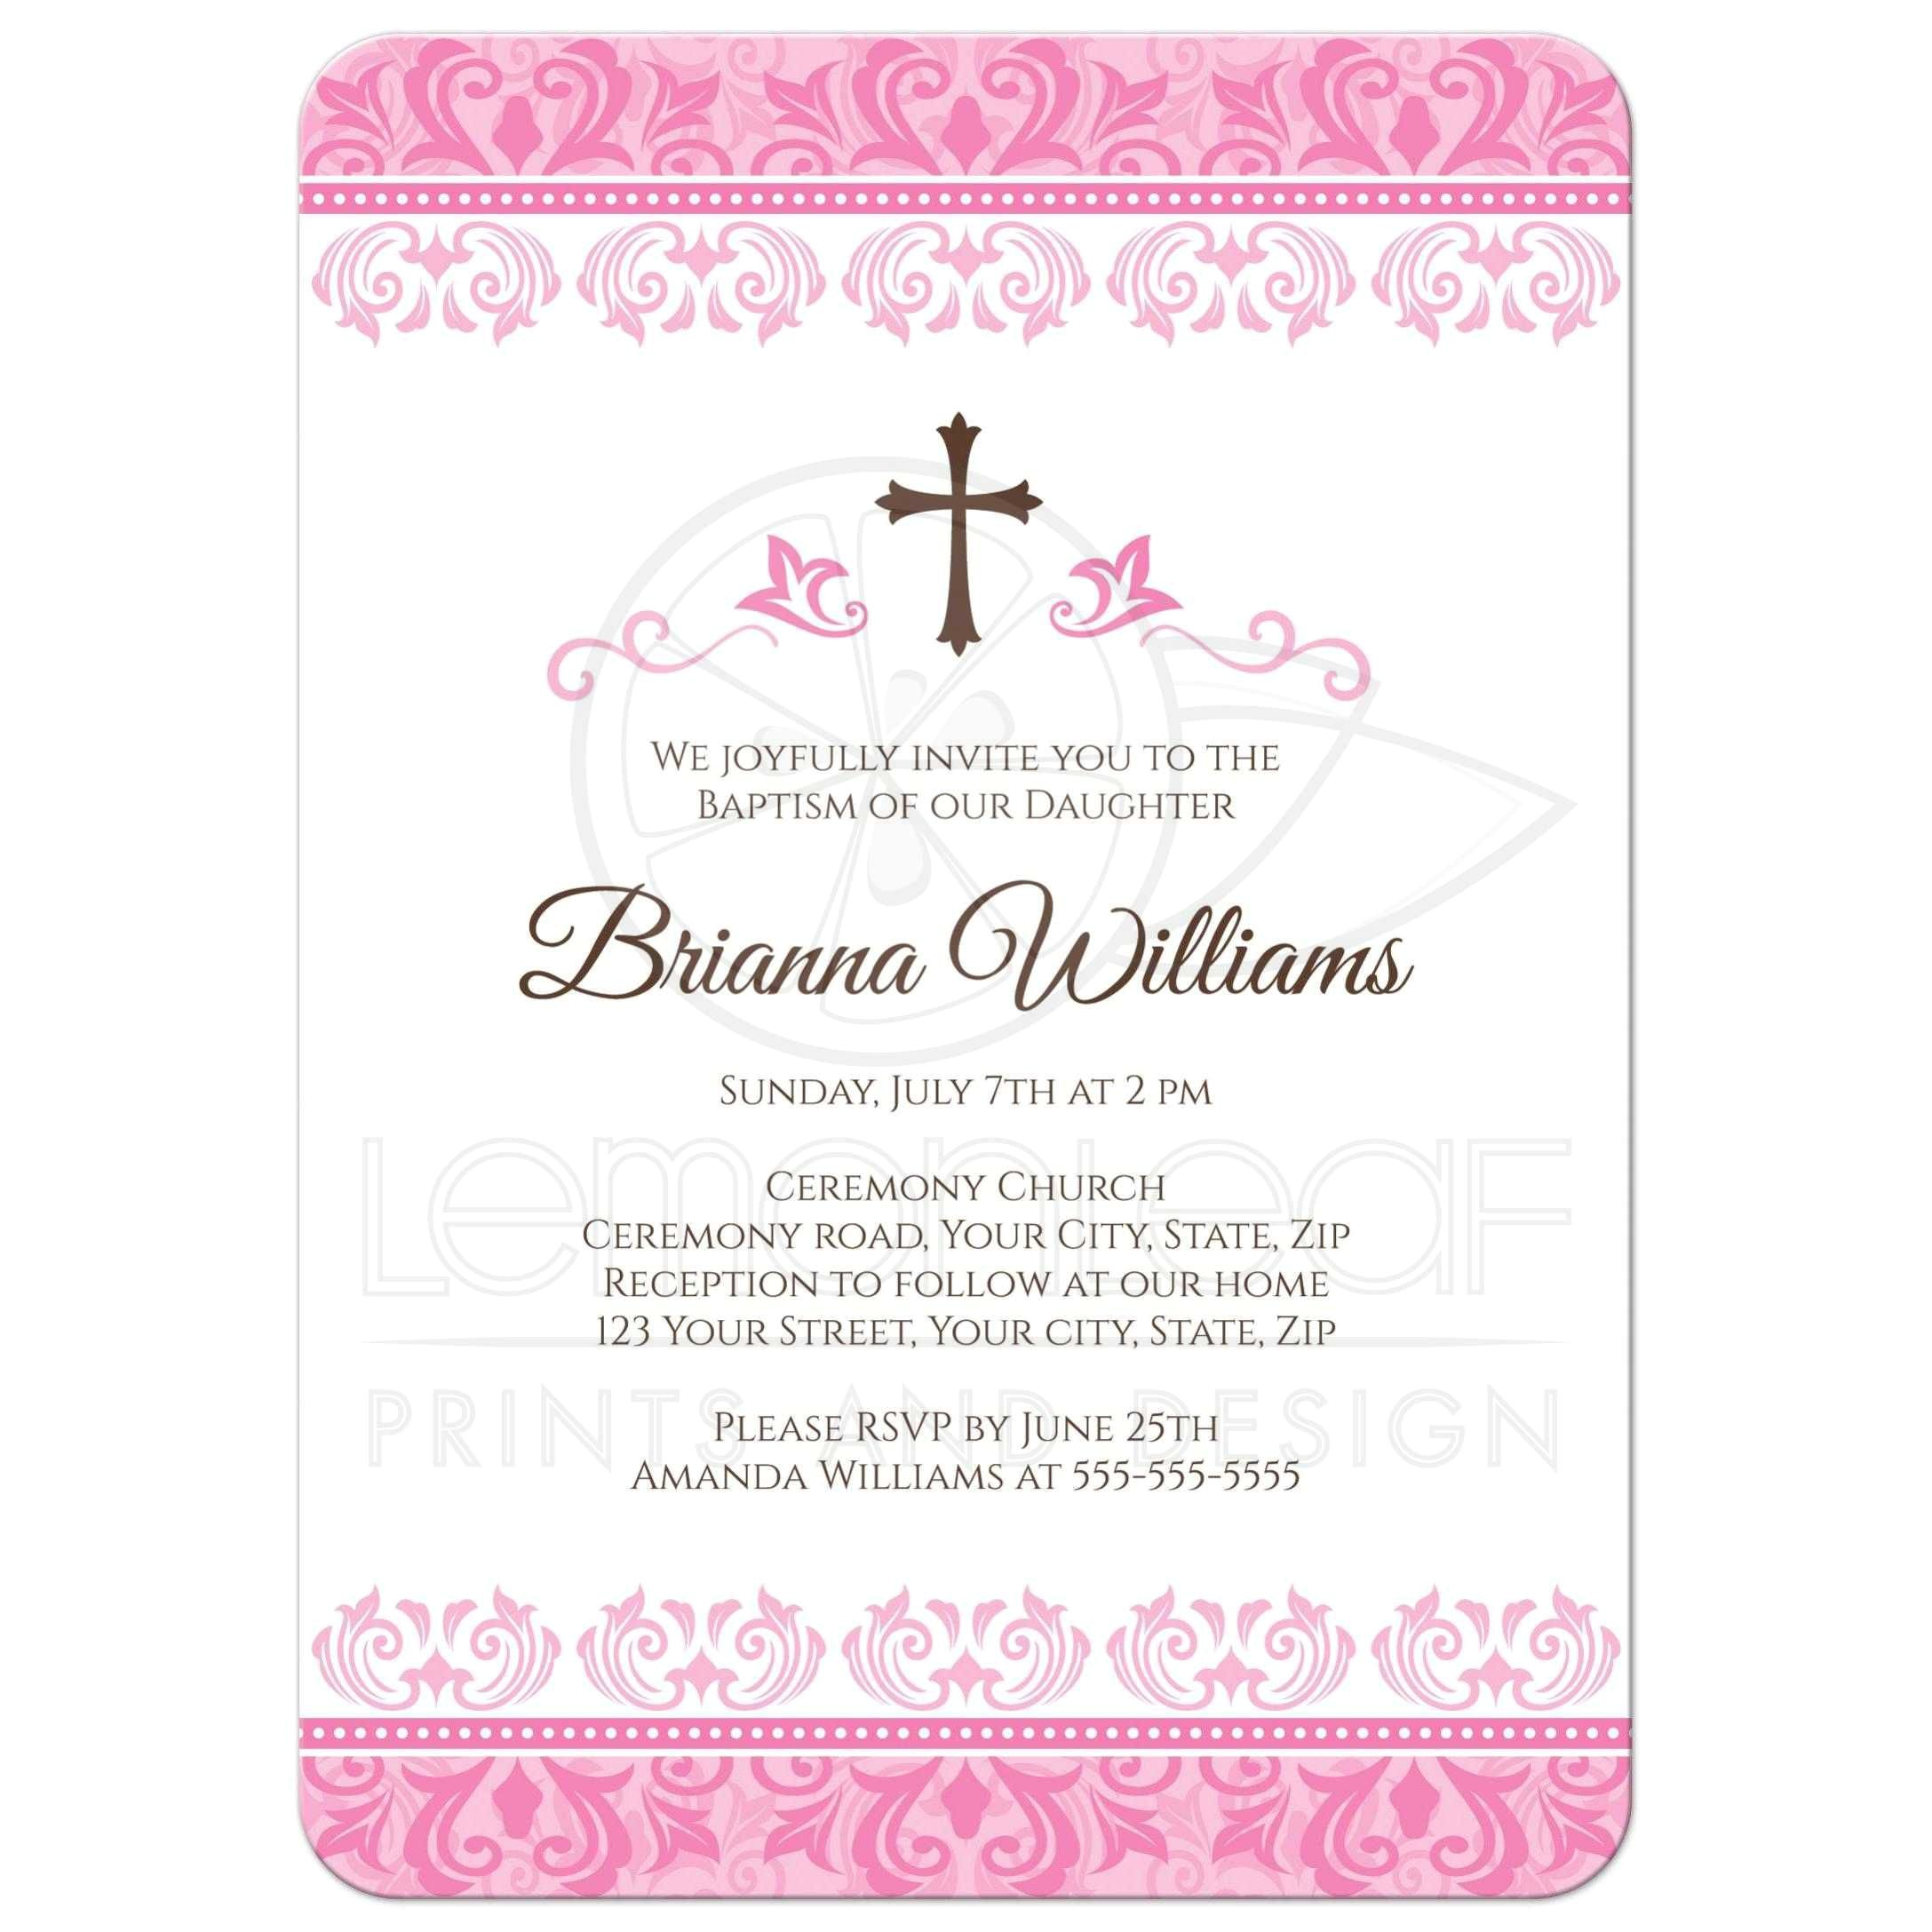 Baptism Bible Verses for Invitations Baptism Invitation Wording Baptism Invitation Wording